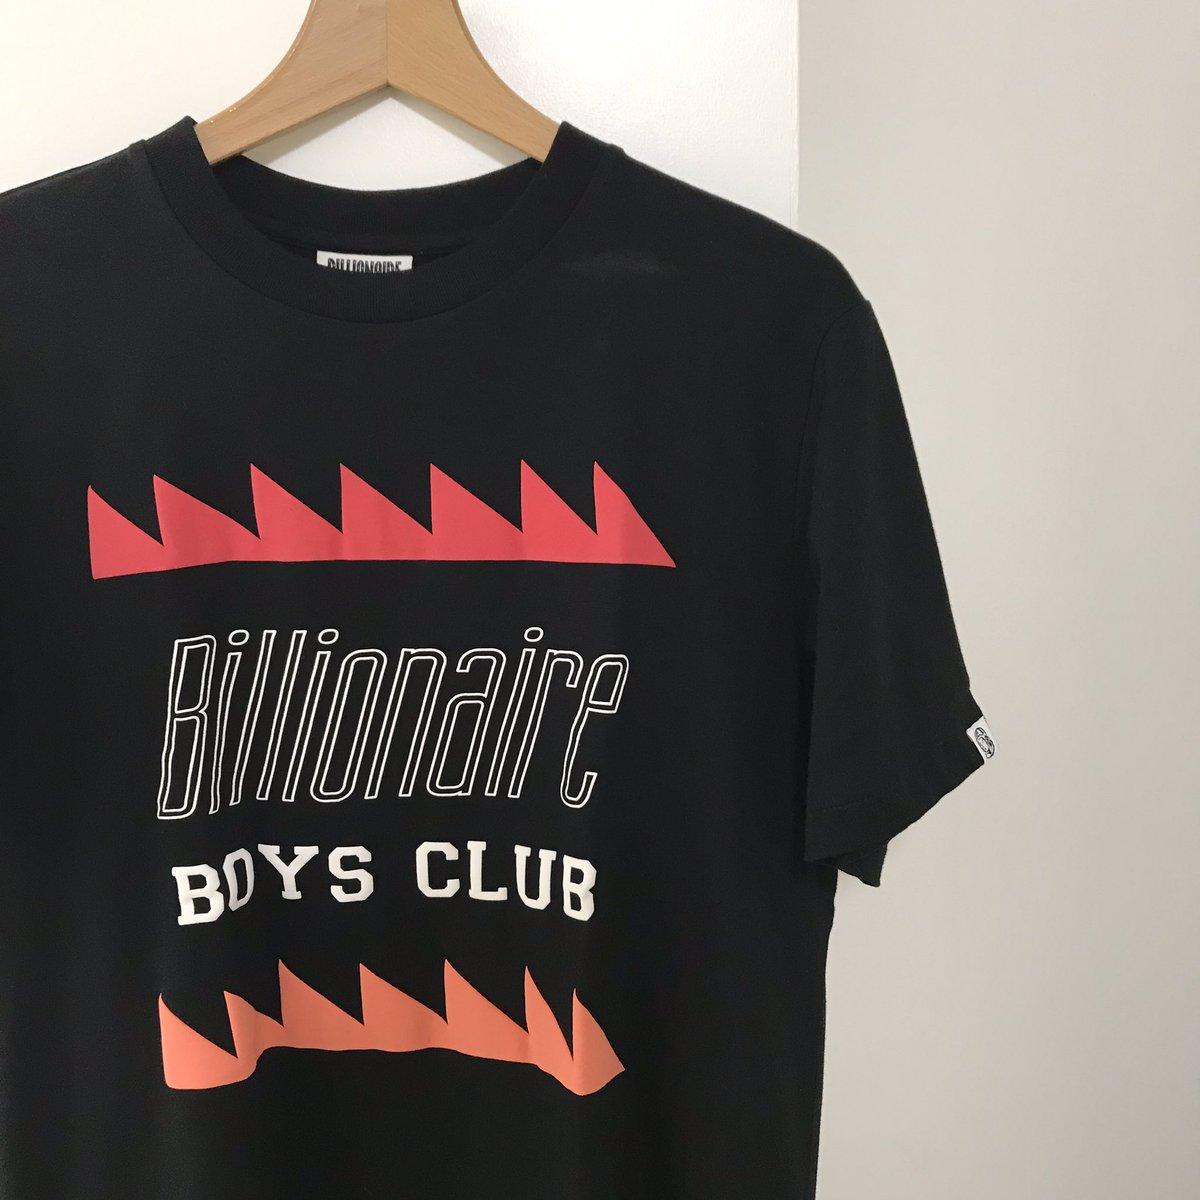 Billionaire Boys Club's Spring drop. - Oscillating Logo T-Shirt @bbcicecream_eu  Available in store now. #BillionaireBoysClub #BBC #New<br>http://pic.twitter.com/jr0Sw1ceDS